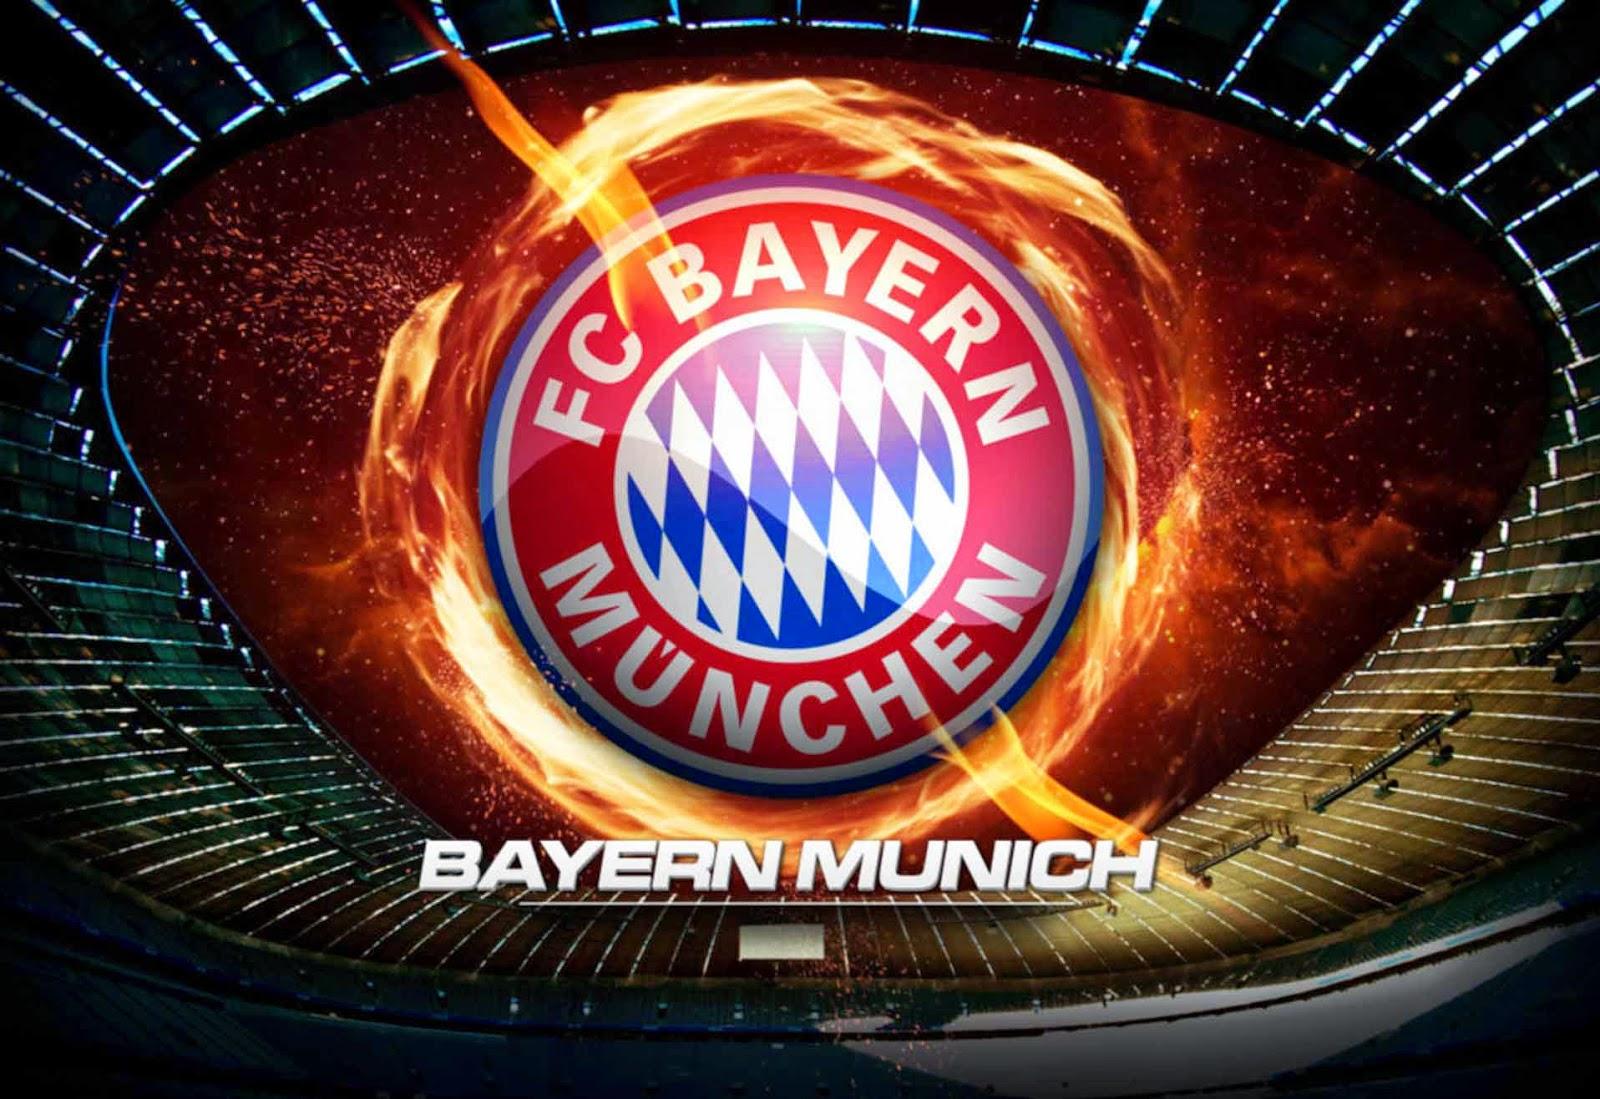 "<img src=""http://3.bp.blogspot.com/-M2If1dd52HM/U96VO2dPujI/AAAAAAAAAbk/7-bwNeRMI-w/s1600/Bayern-Munich.jpg"" alt=""Richest Football Clubs in the World"" />"